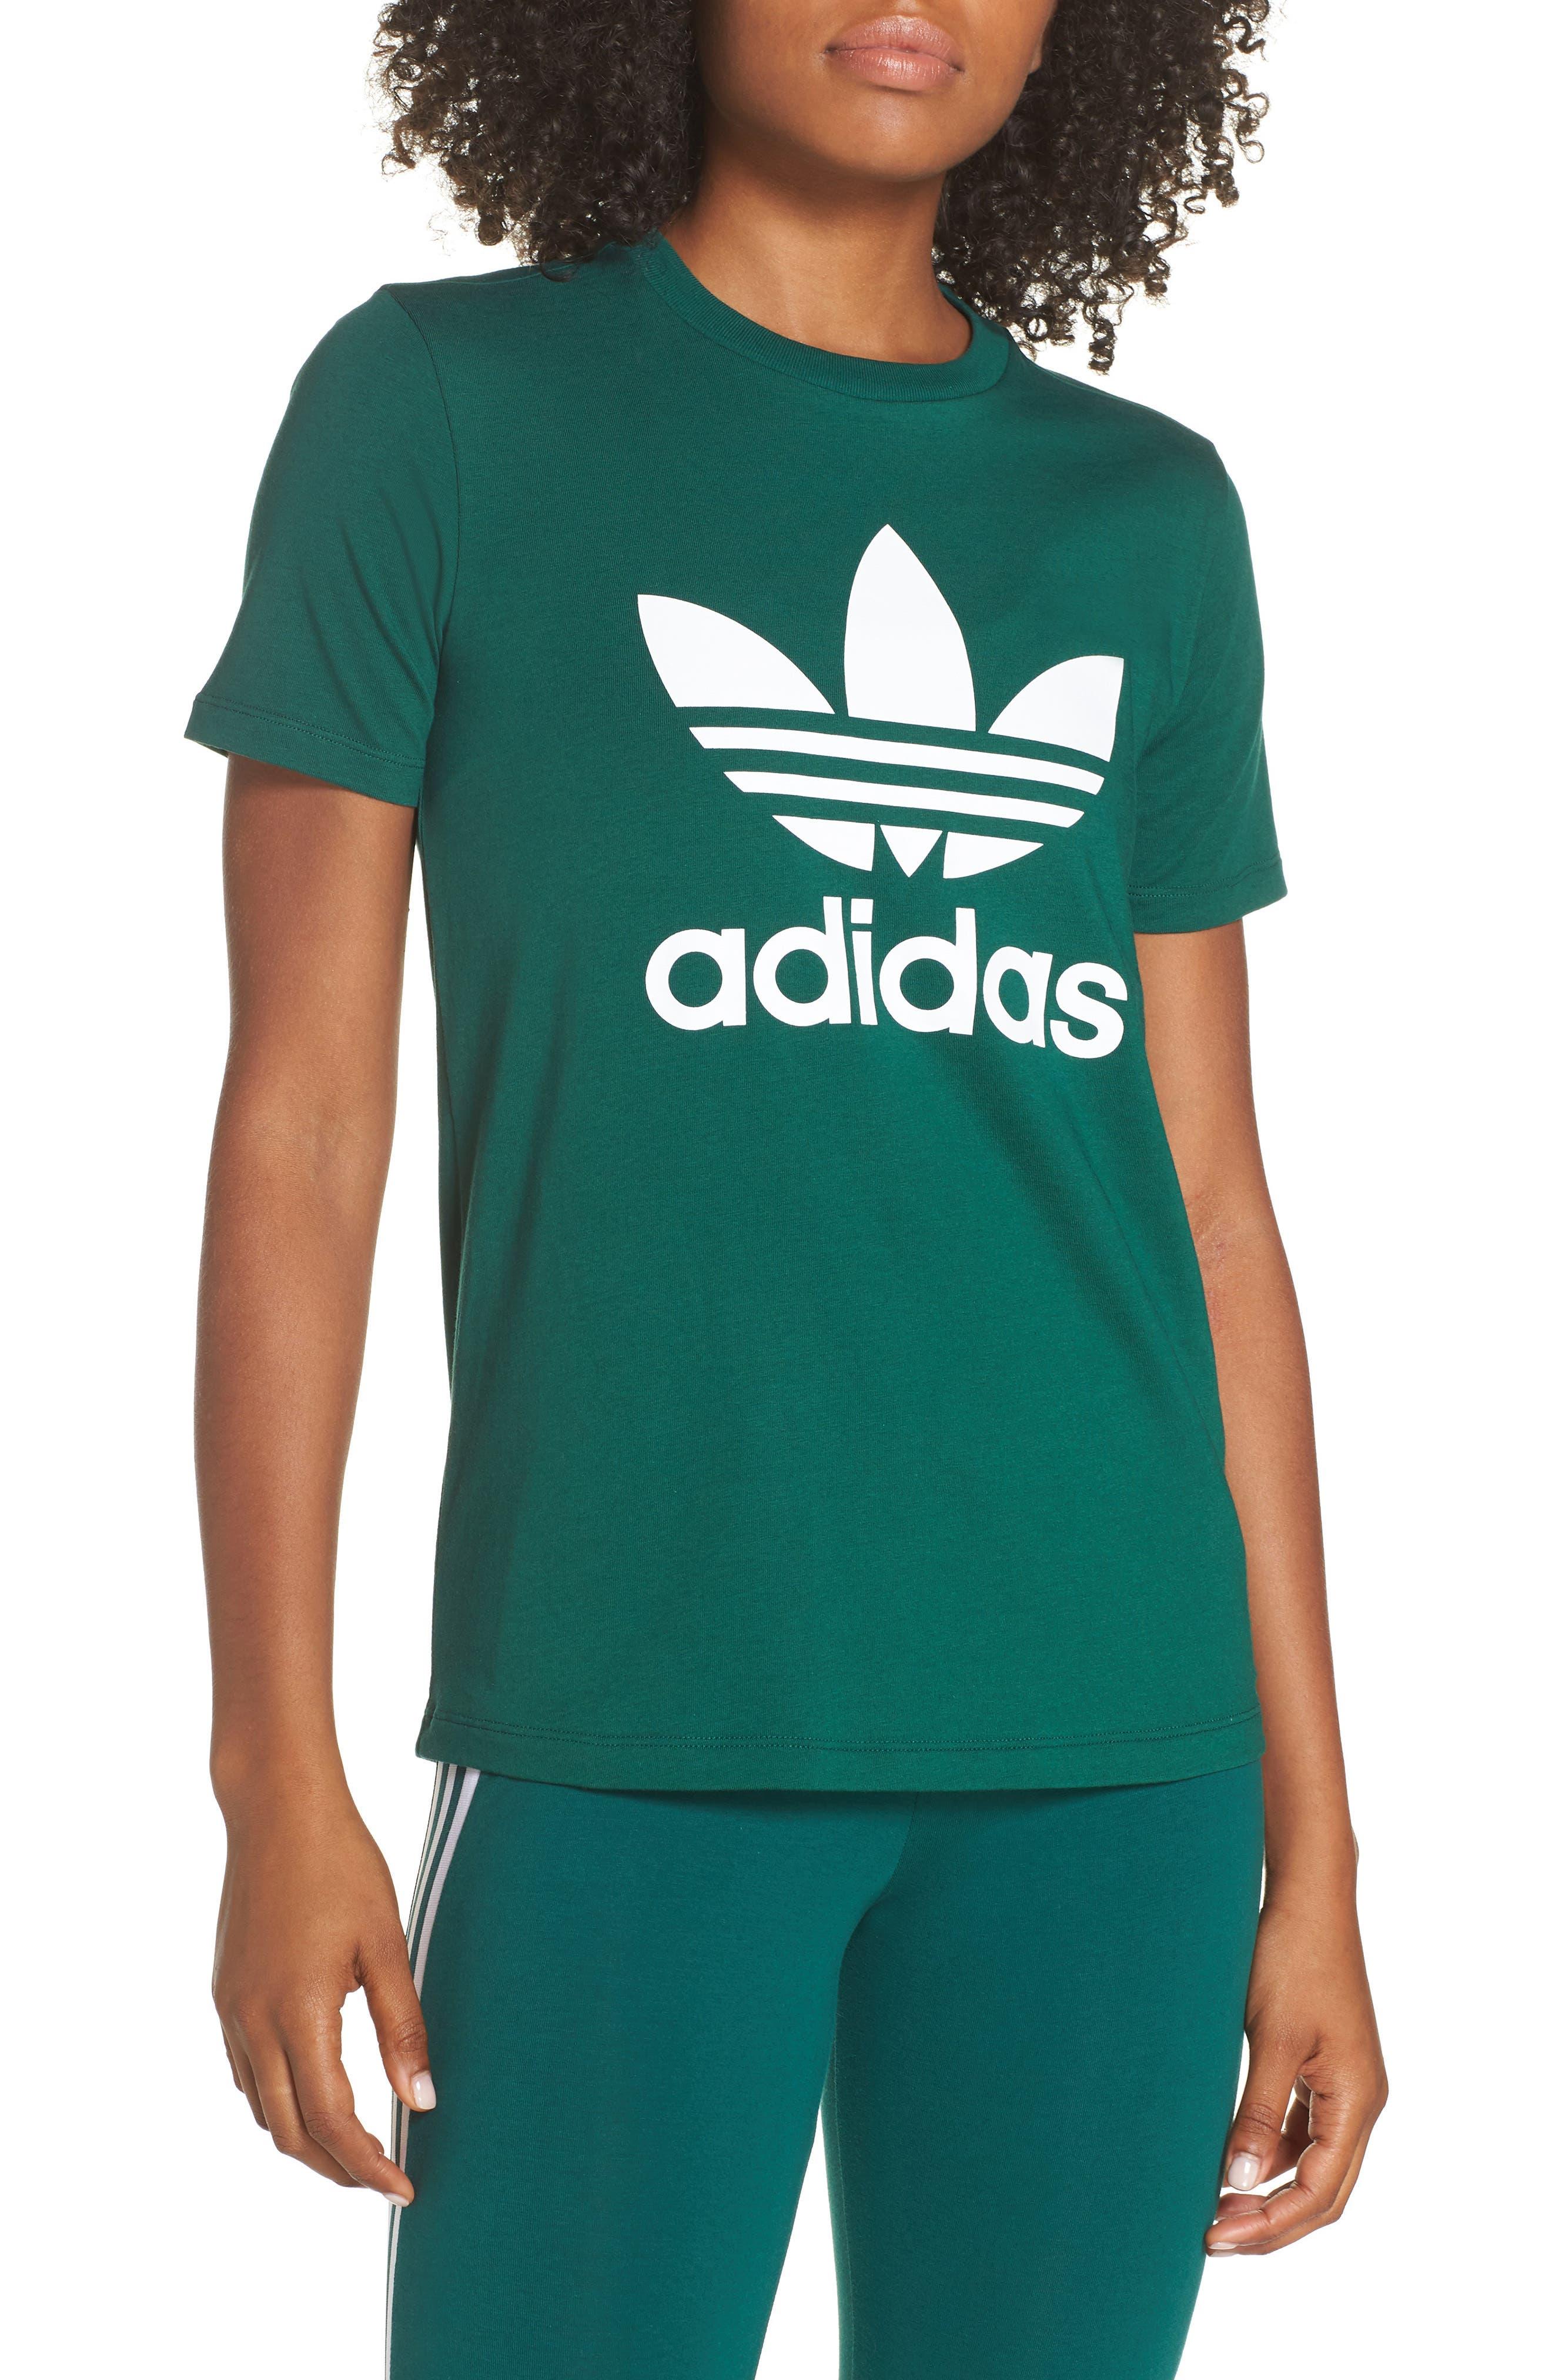 adidas Trefoil Tee,                         Main,                         color, COLLEGIATE GREEN